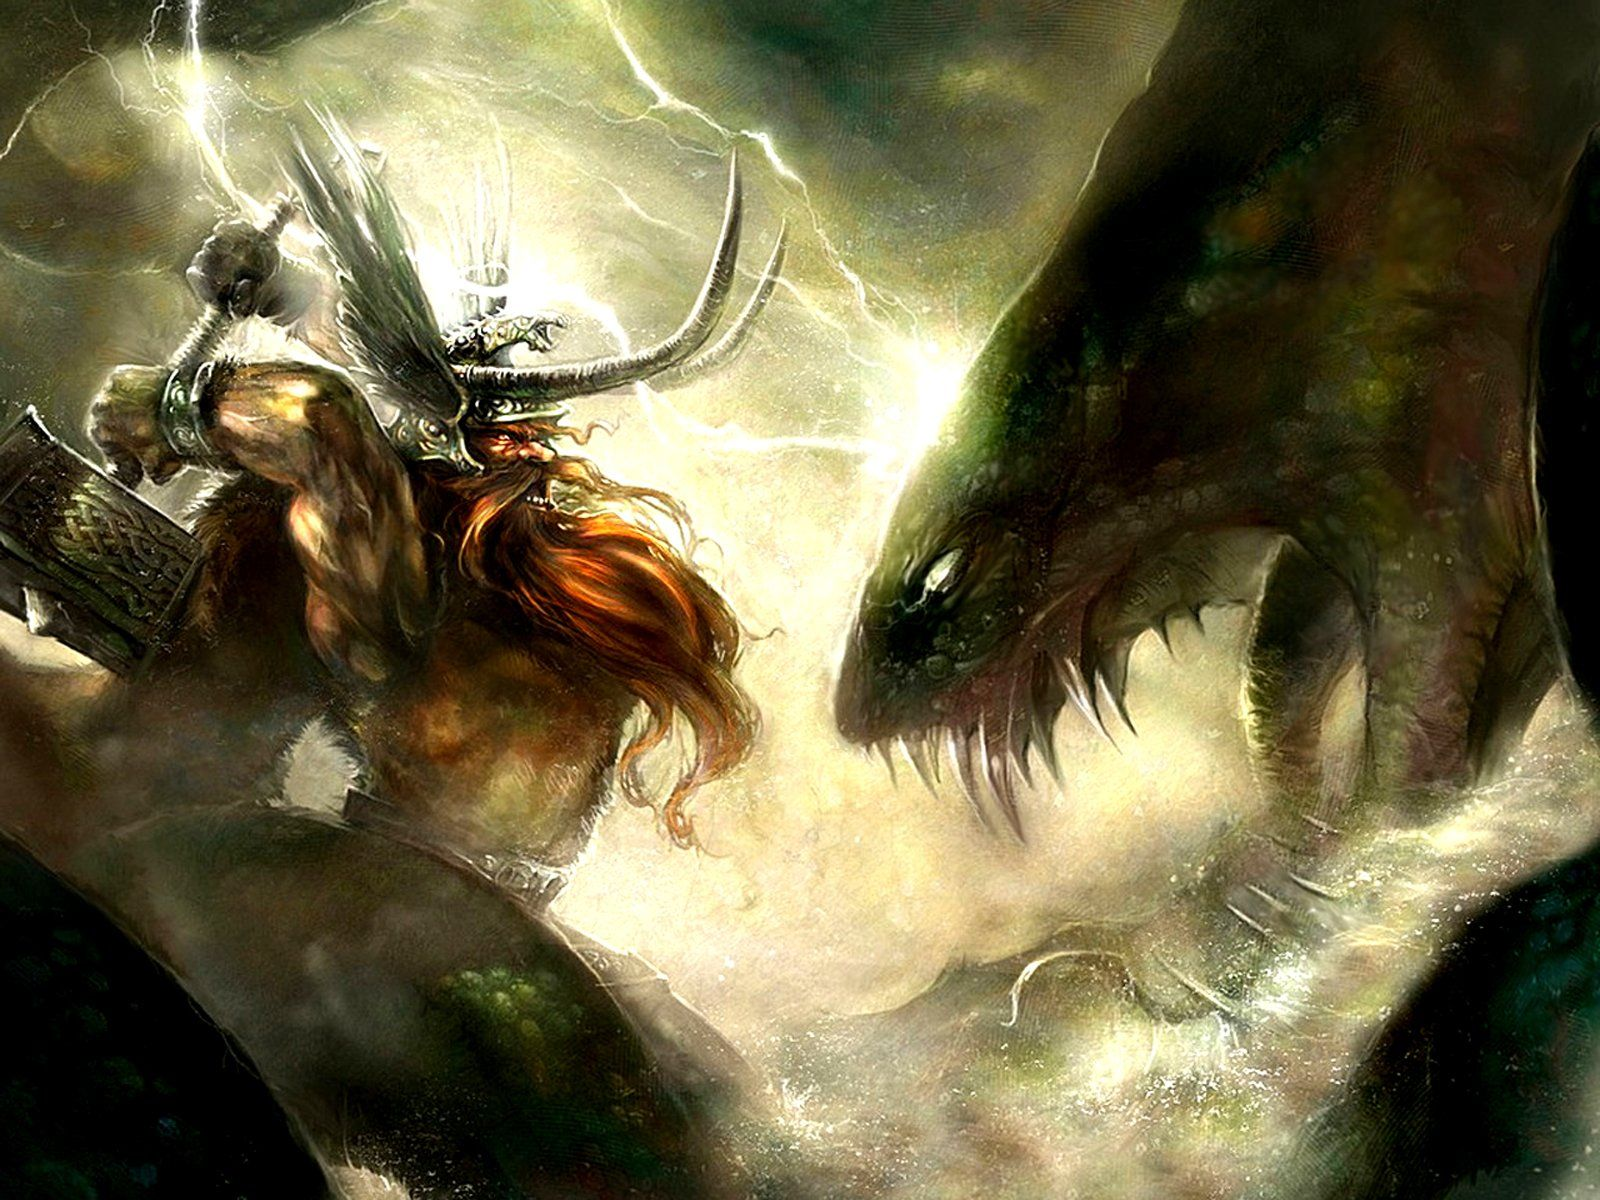 89 Gods Hd Wallpapers Backgrounds Wallpaper Abyss Norse Mythology Norse Mythology